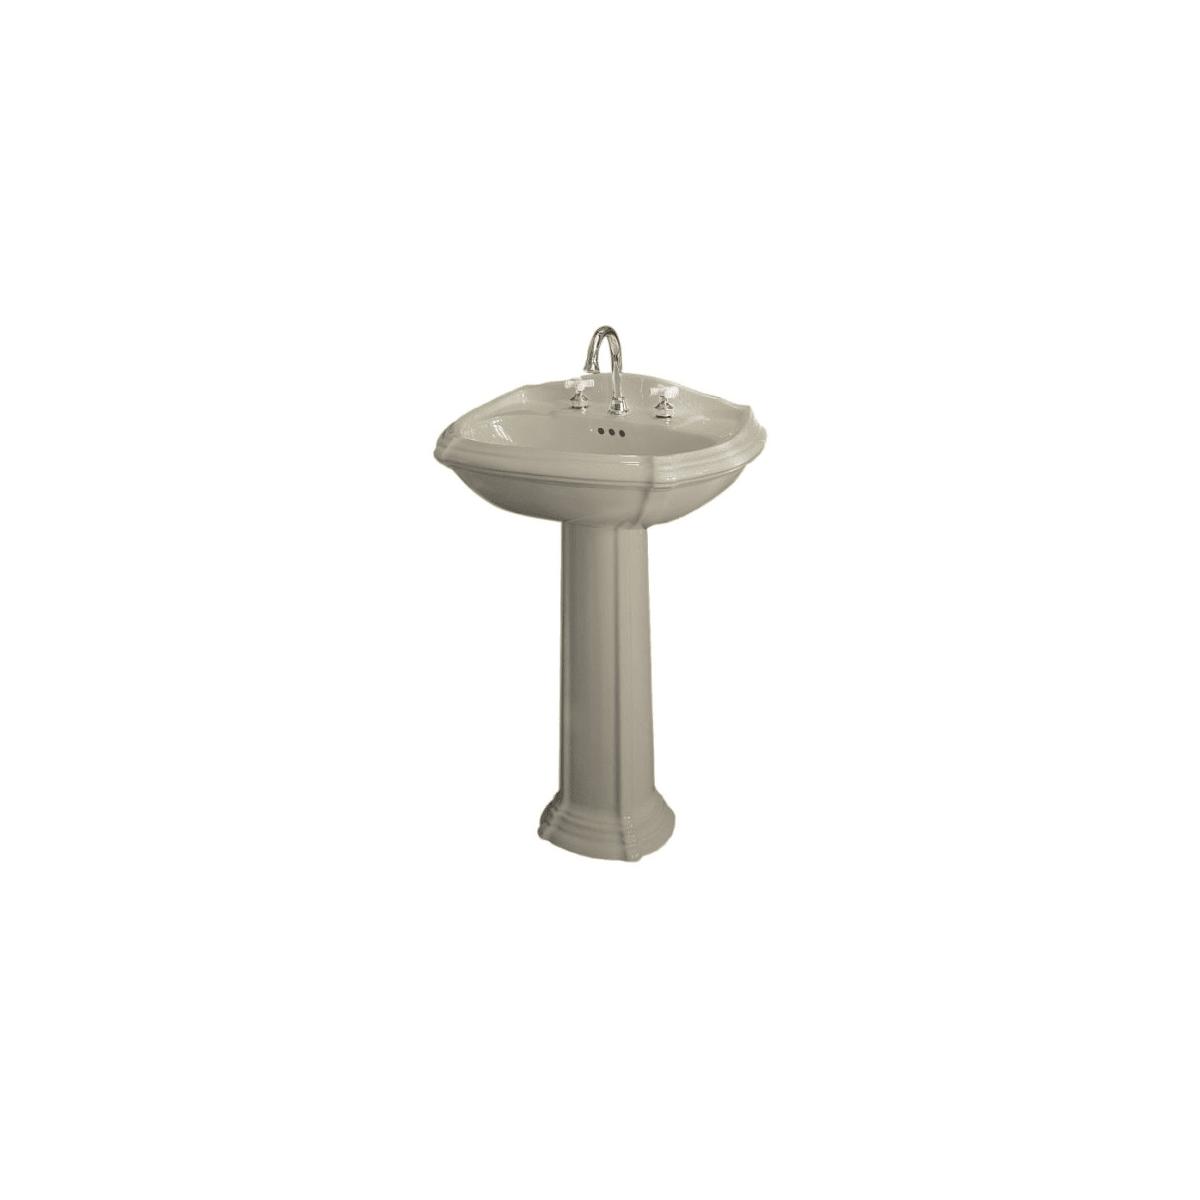 Kohler Portrait Pedestal Sink.Kohler K 2221 1